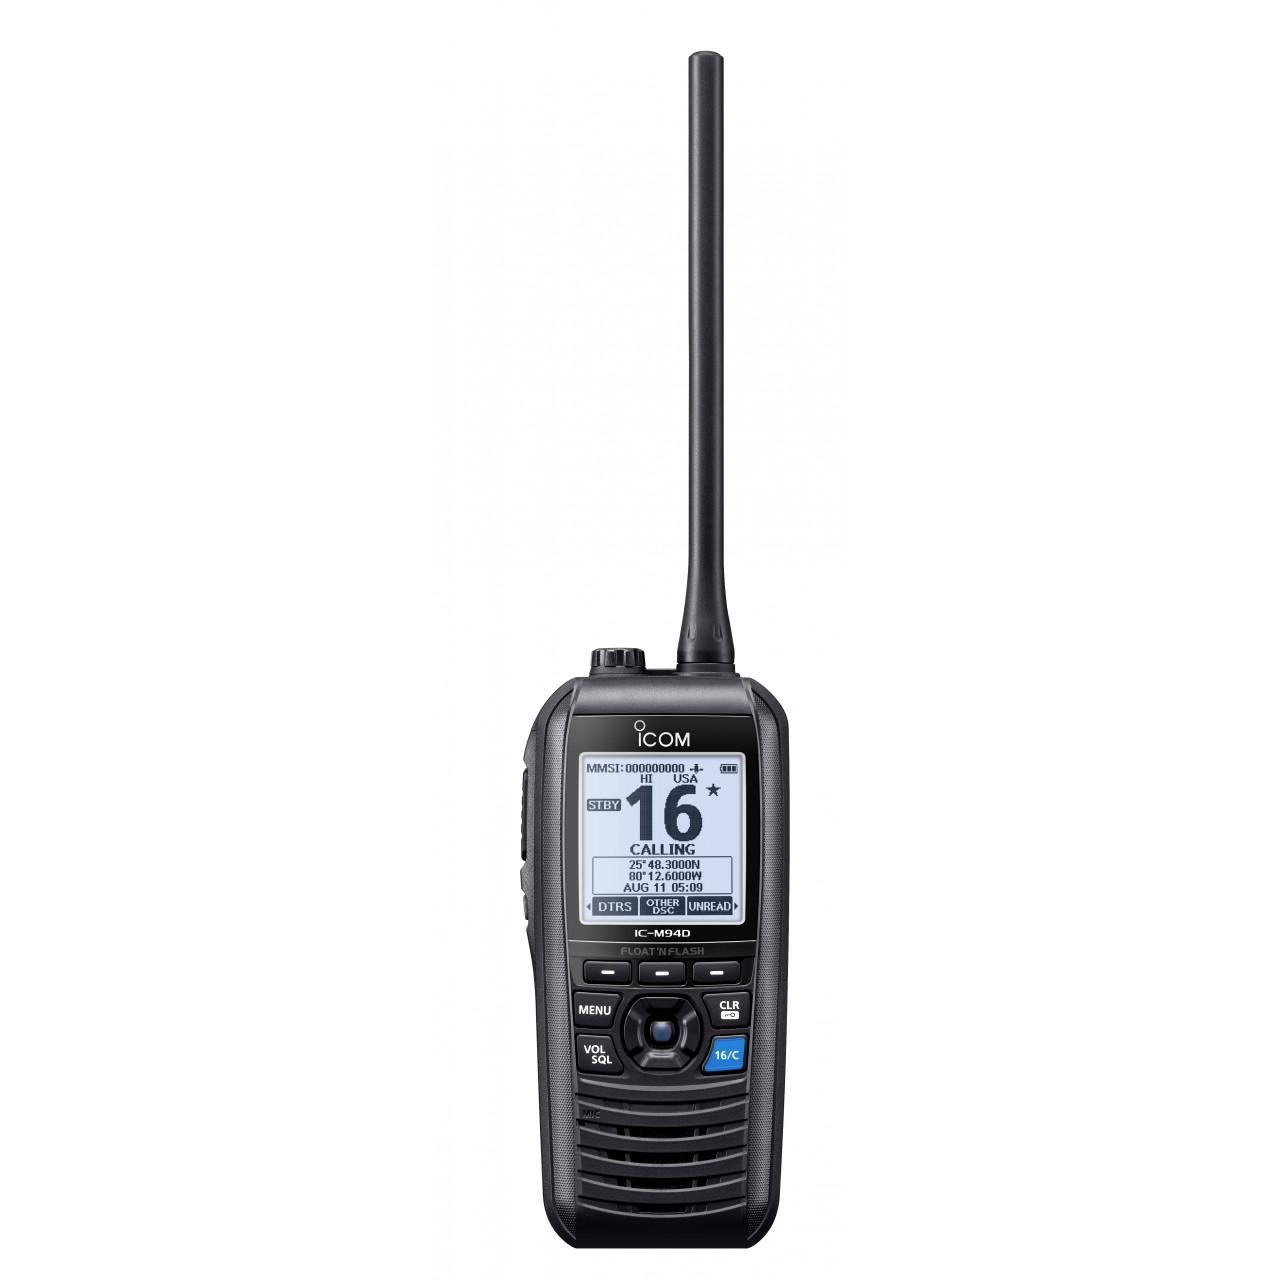 VHF portable marine avec GPS, ASN et AIS IC-M94DE